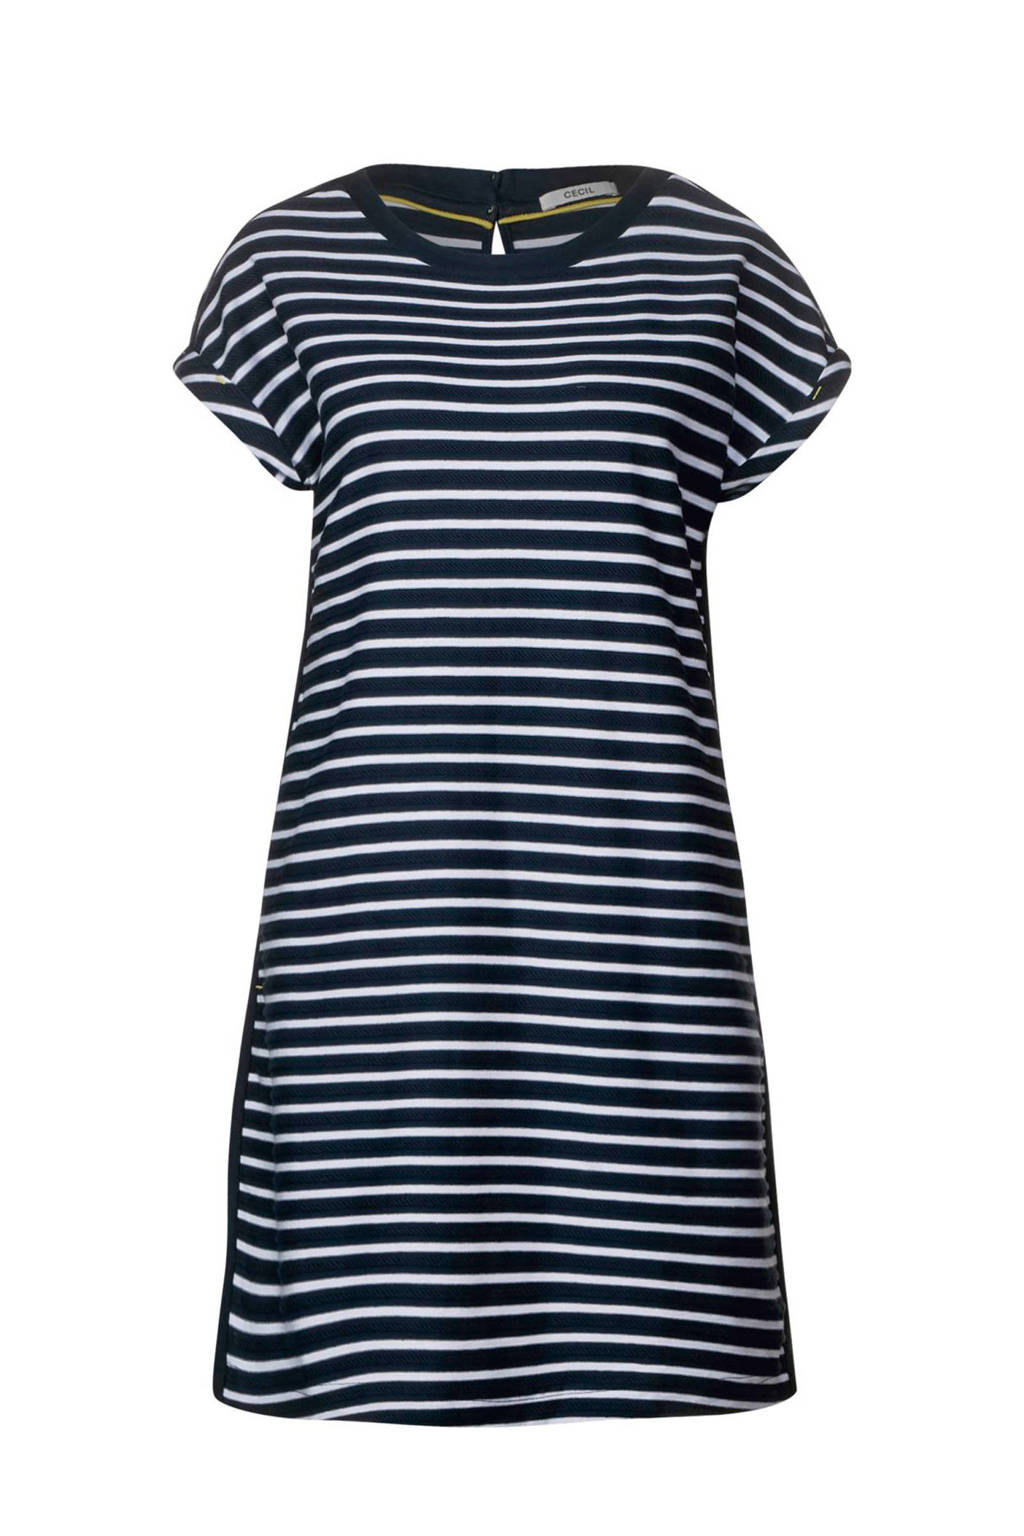 CECIL gestreepte jurk donkerblauw, Donkerblauw/ecru